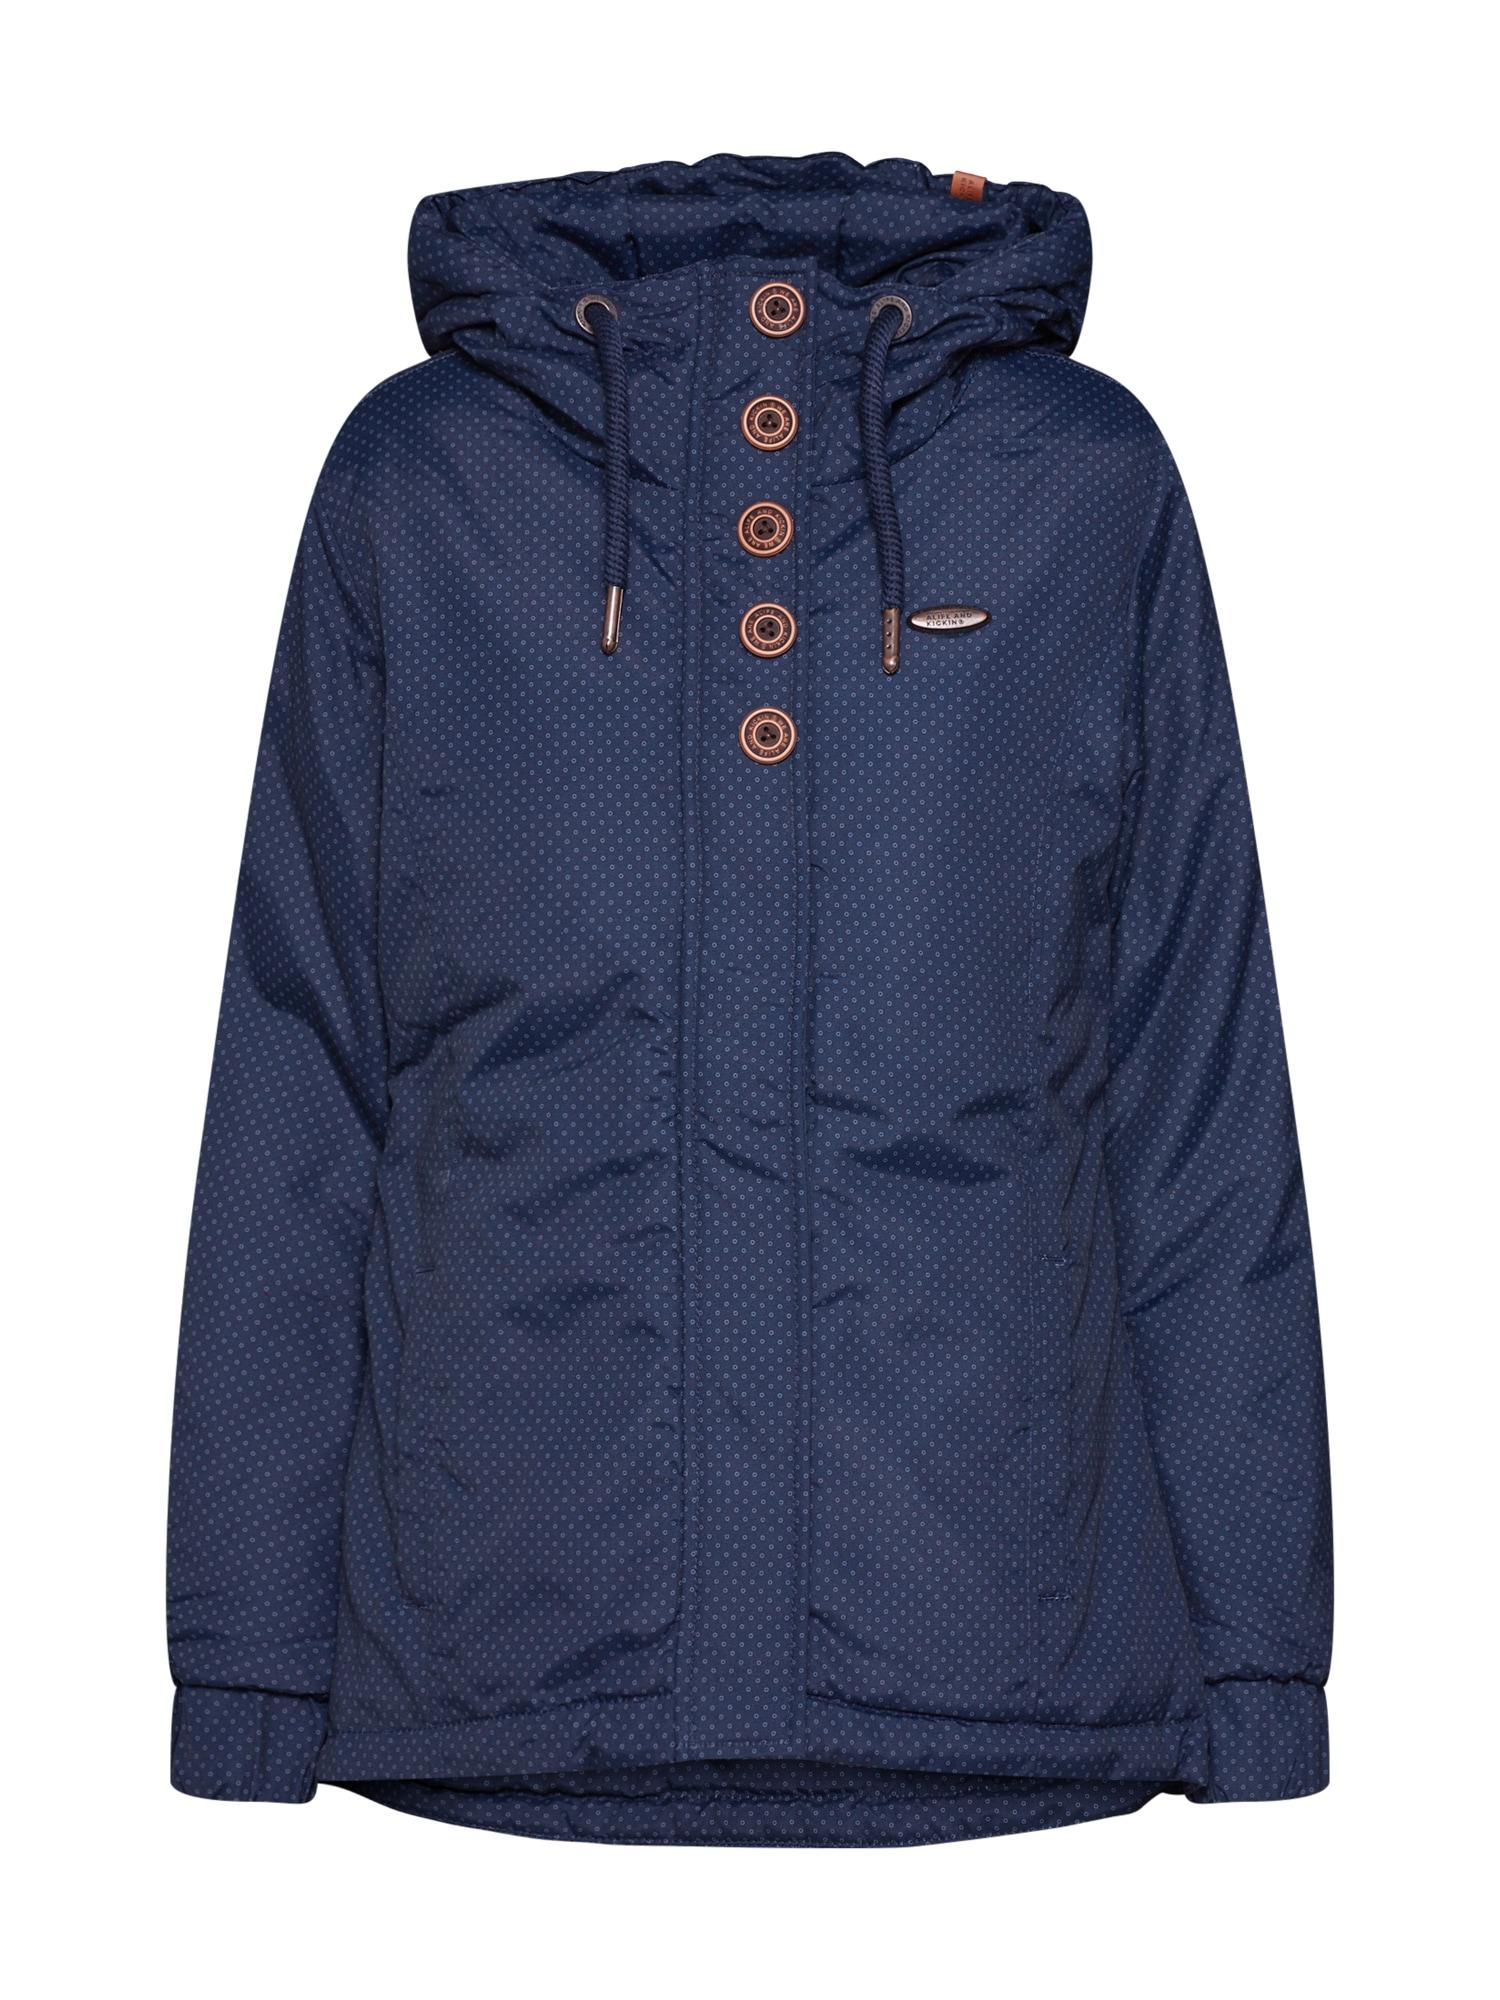 Zimní bunda JADE marine modrá Alife And Kickin